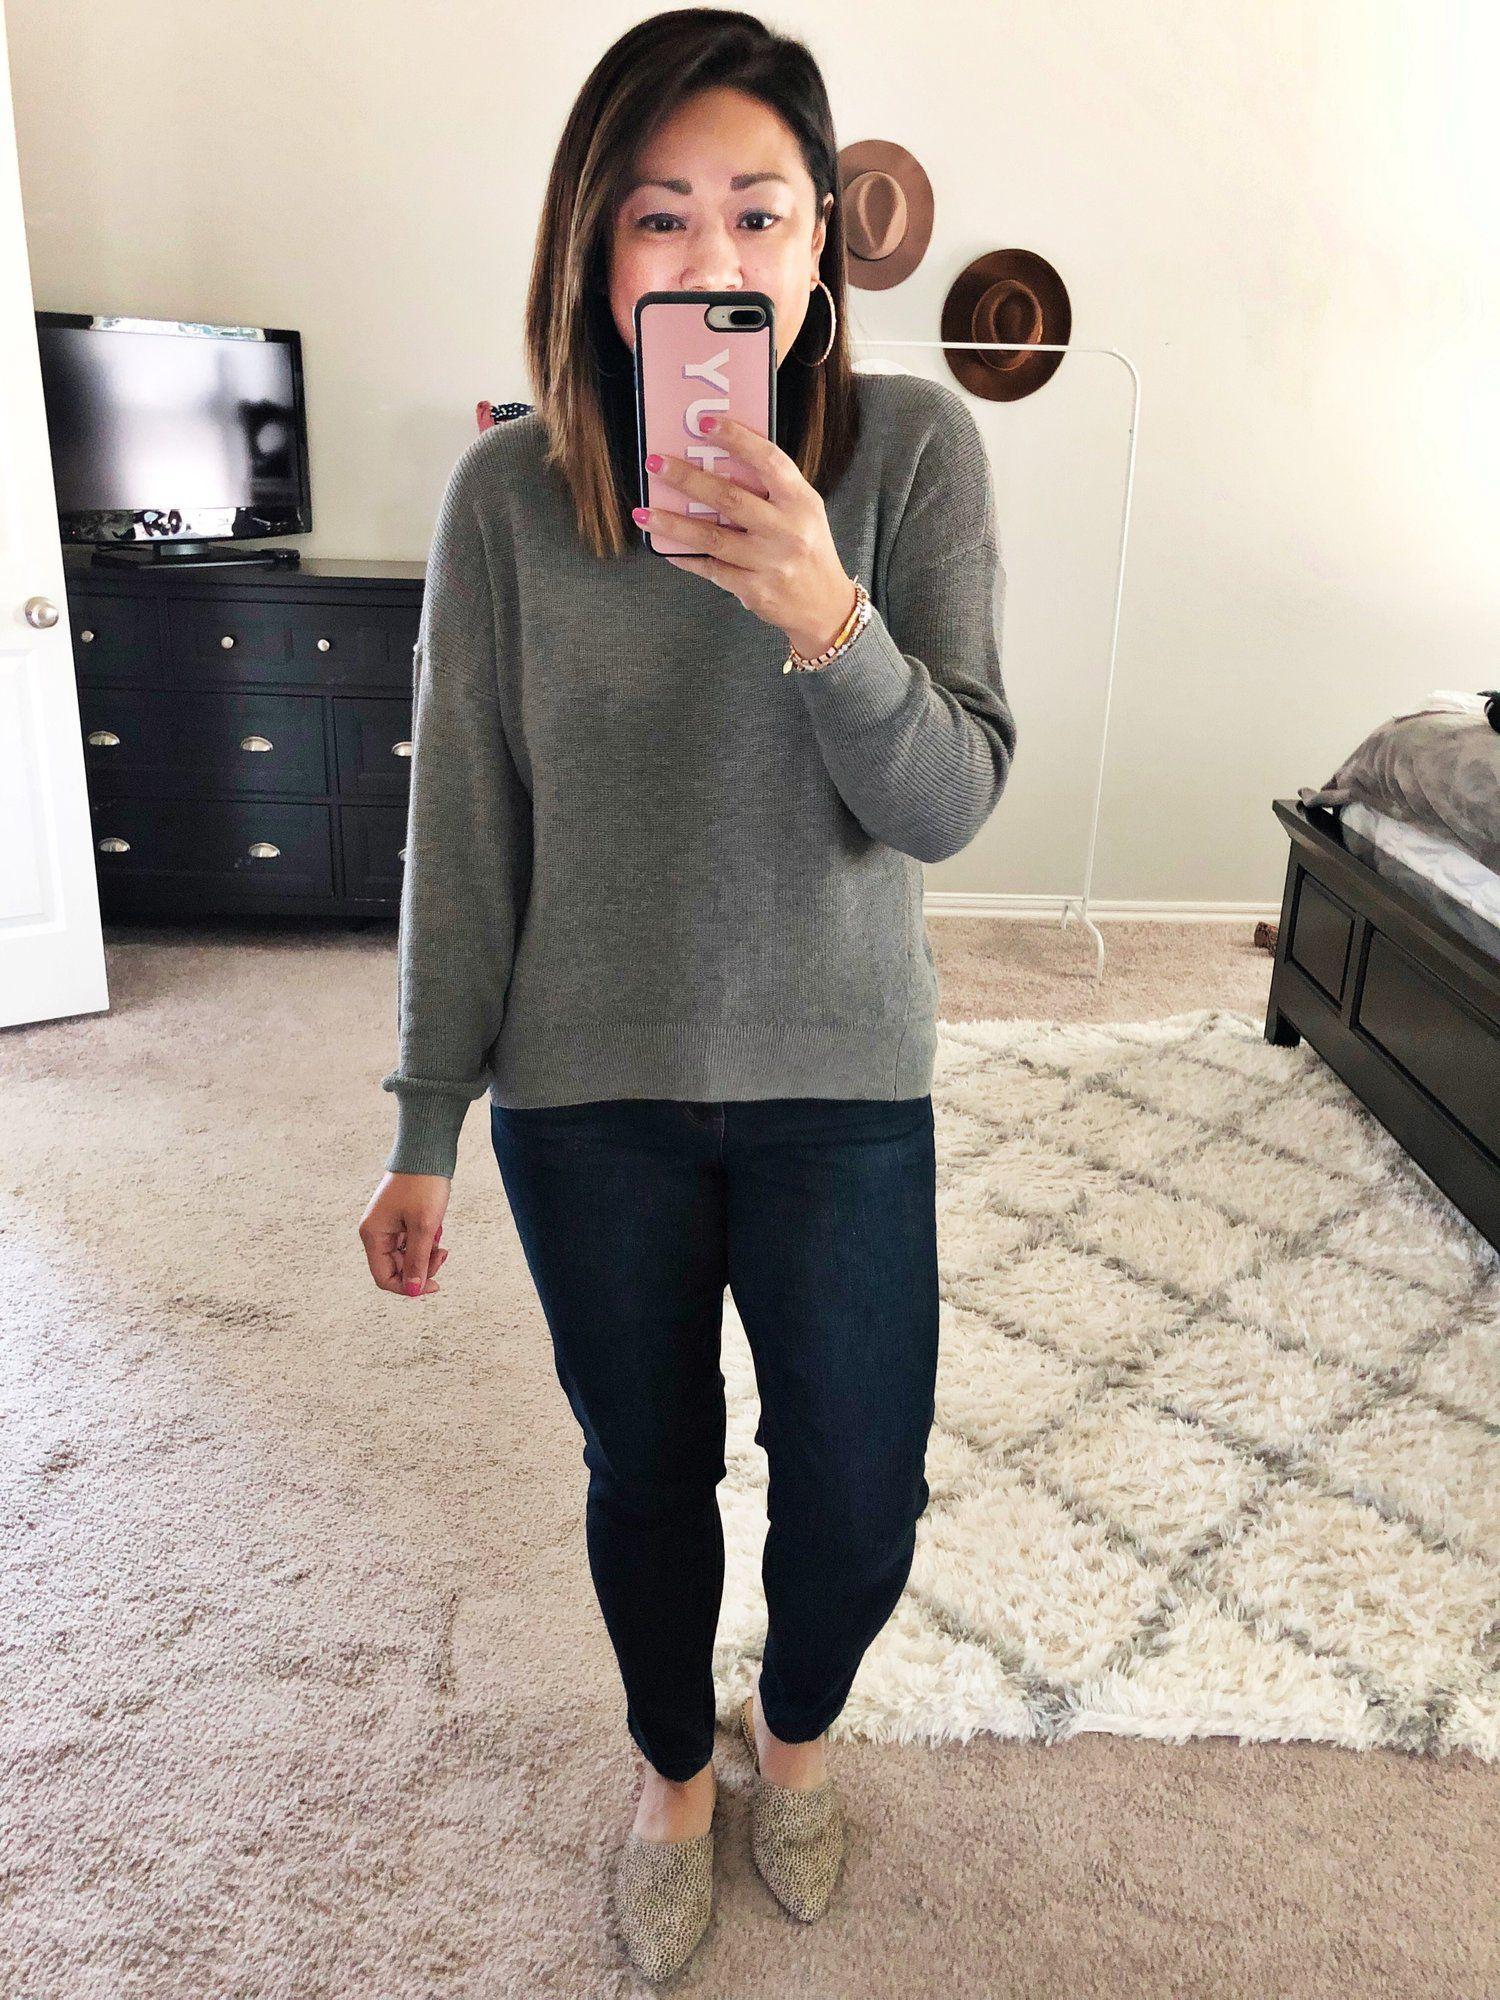 Nsale 2019 Try On Sweaters Jeans Light Denim Wit